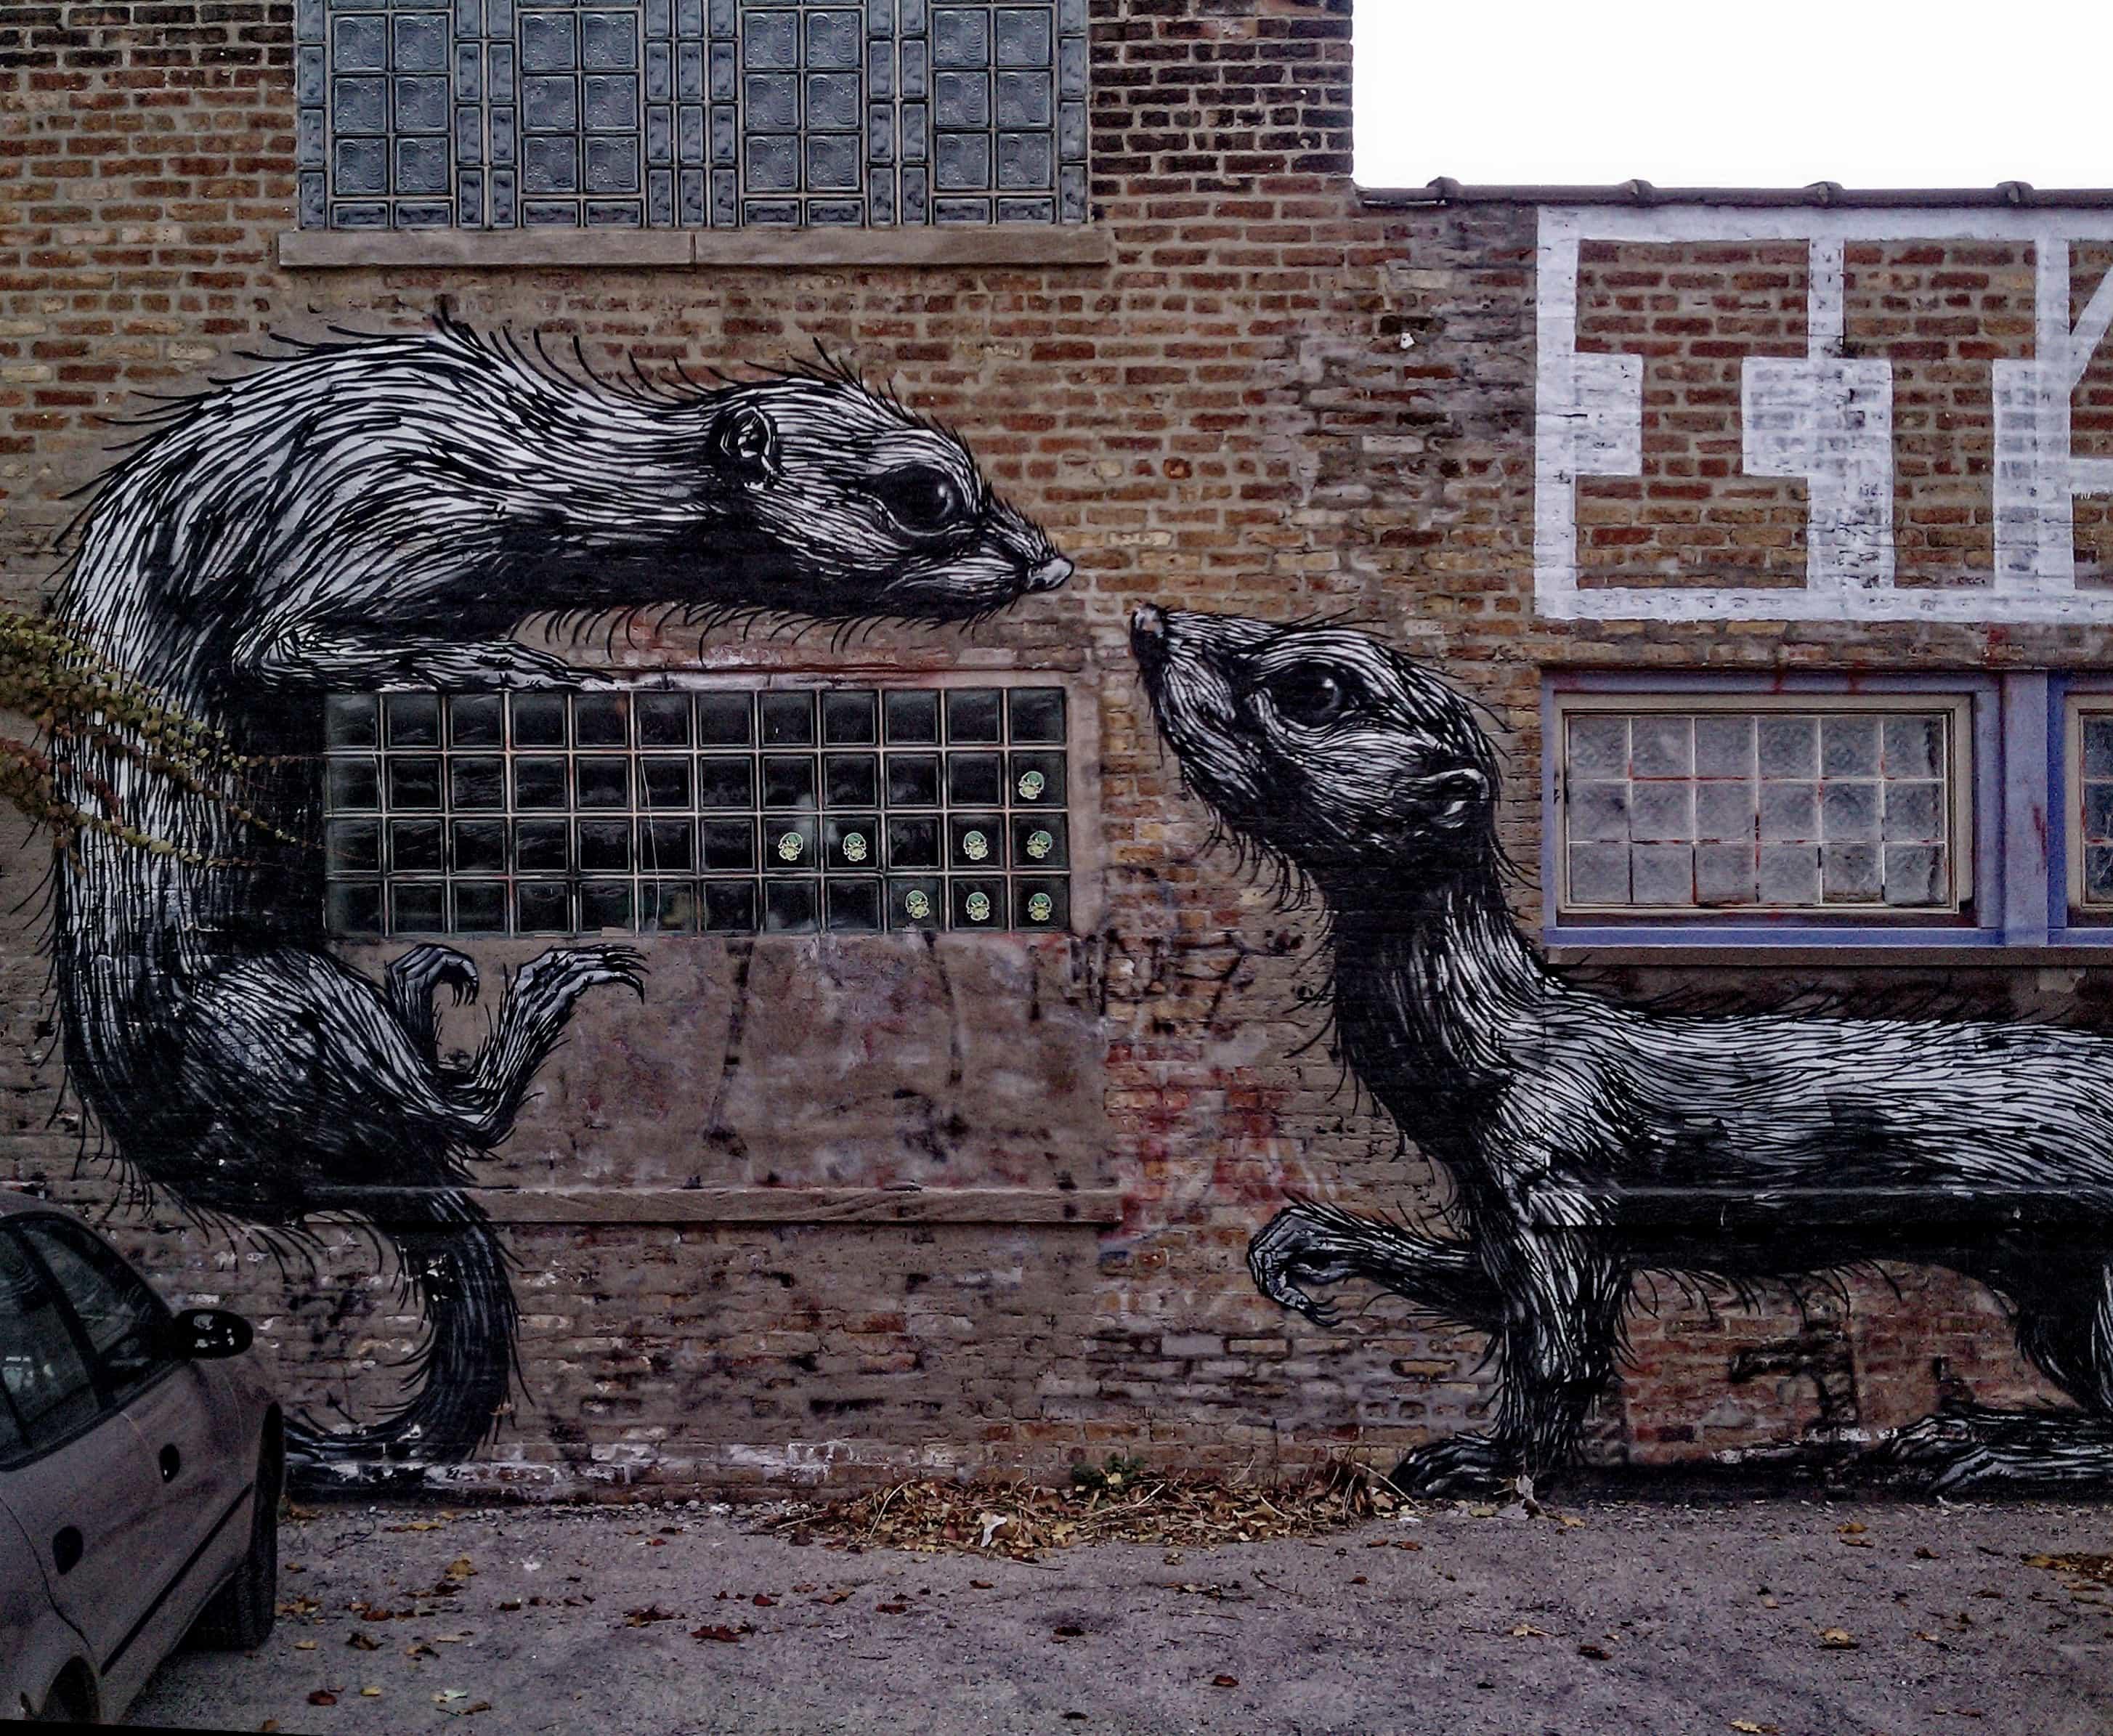 Rats-Fighting-johnpaulgoguen-CC.jpg